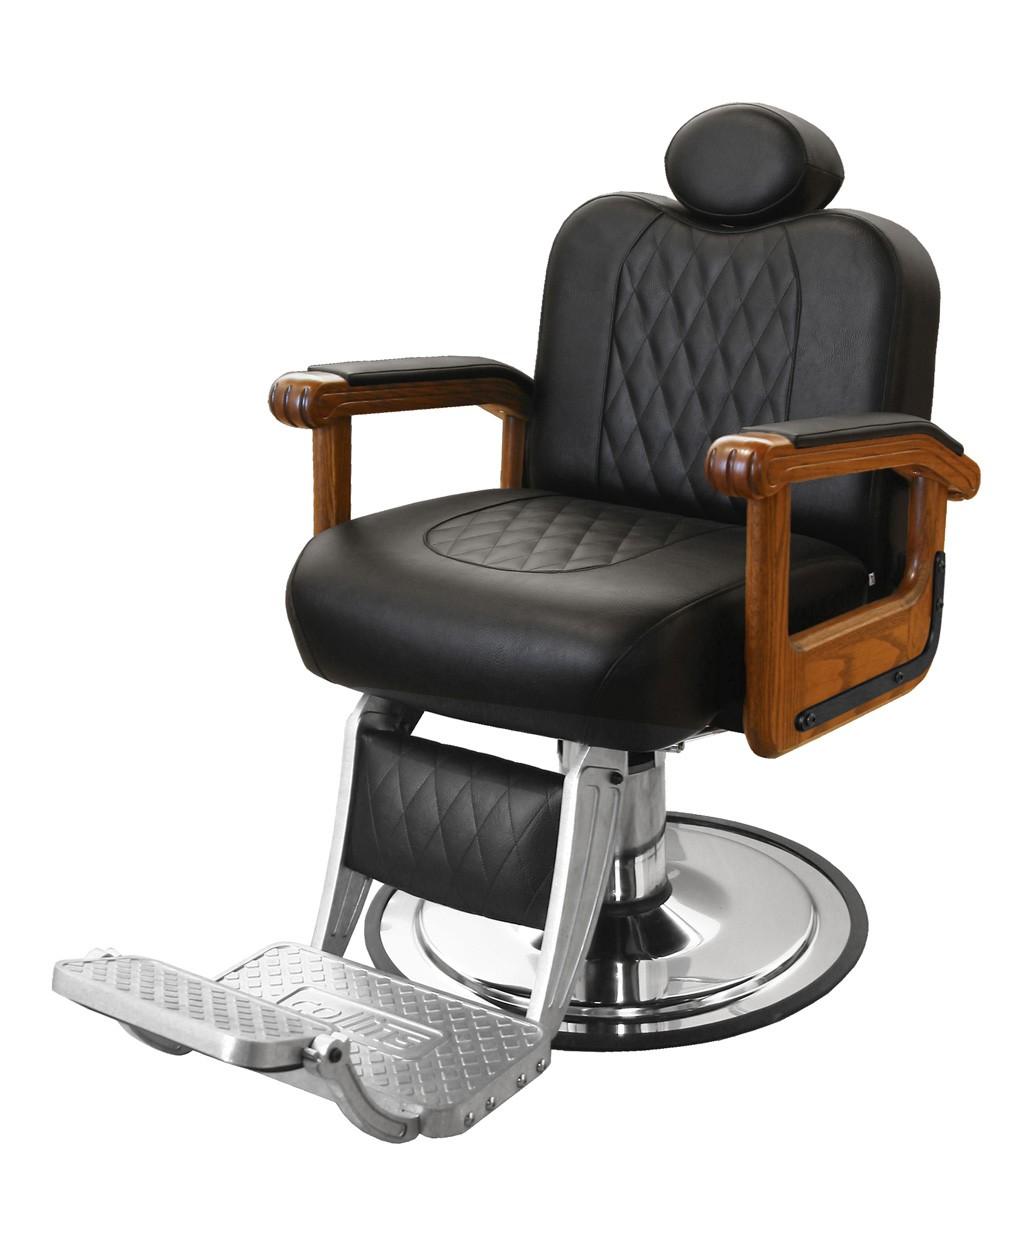 Cavalier barber chair salon furniture toronto canada usf for Salon furniture canada